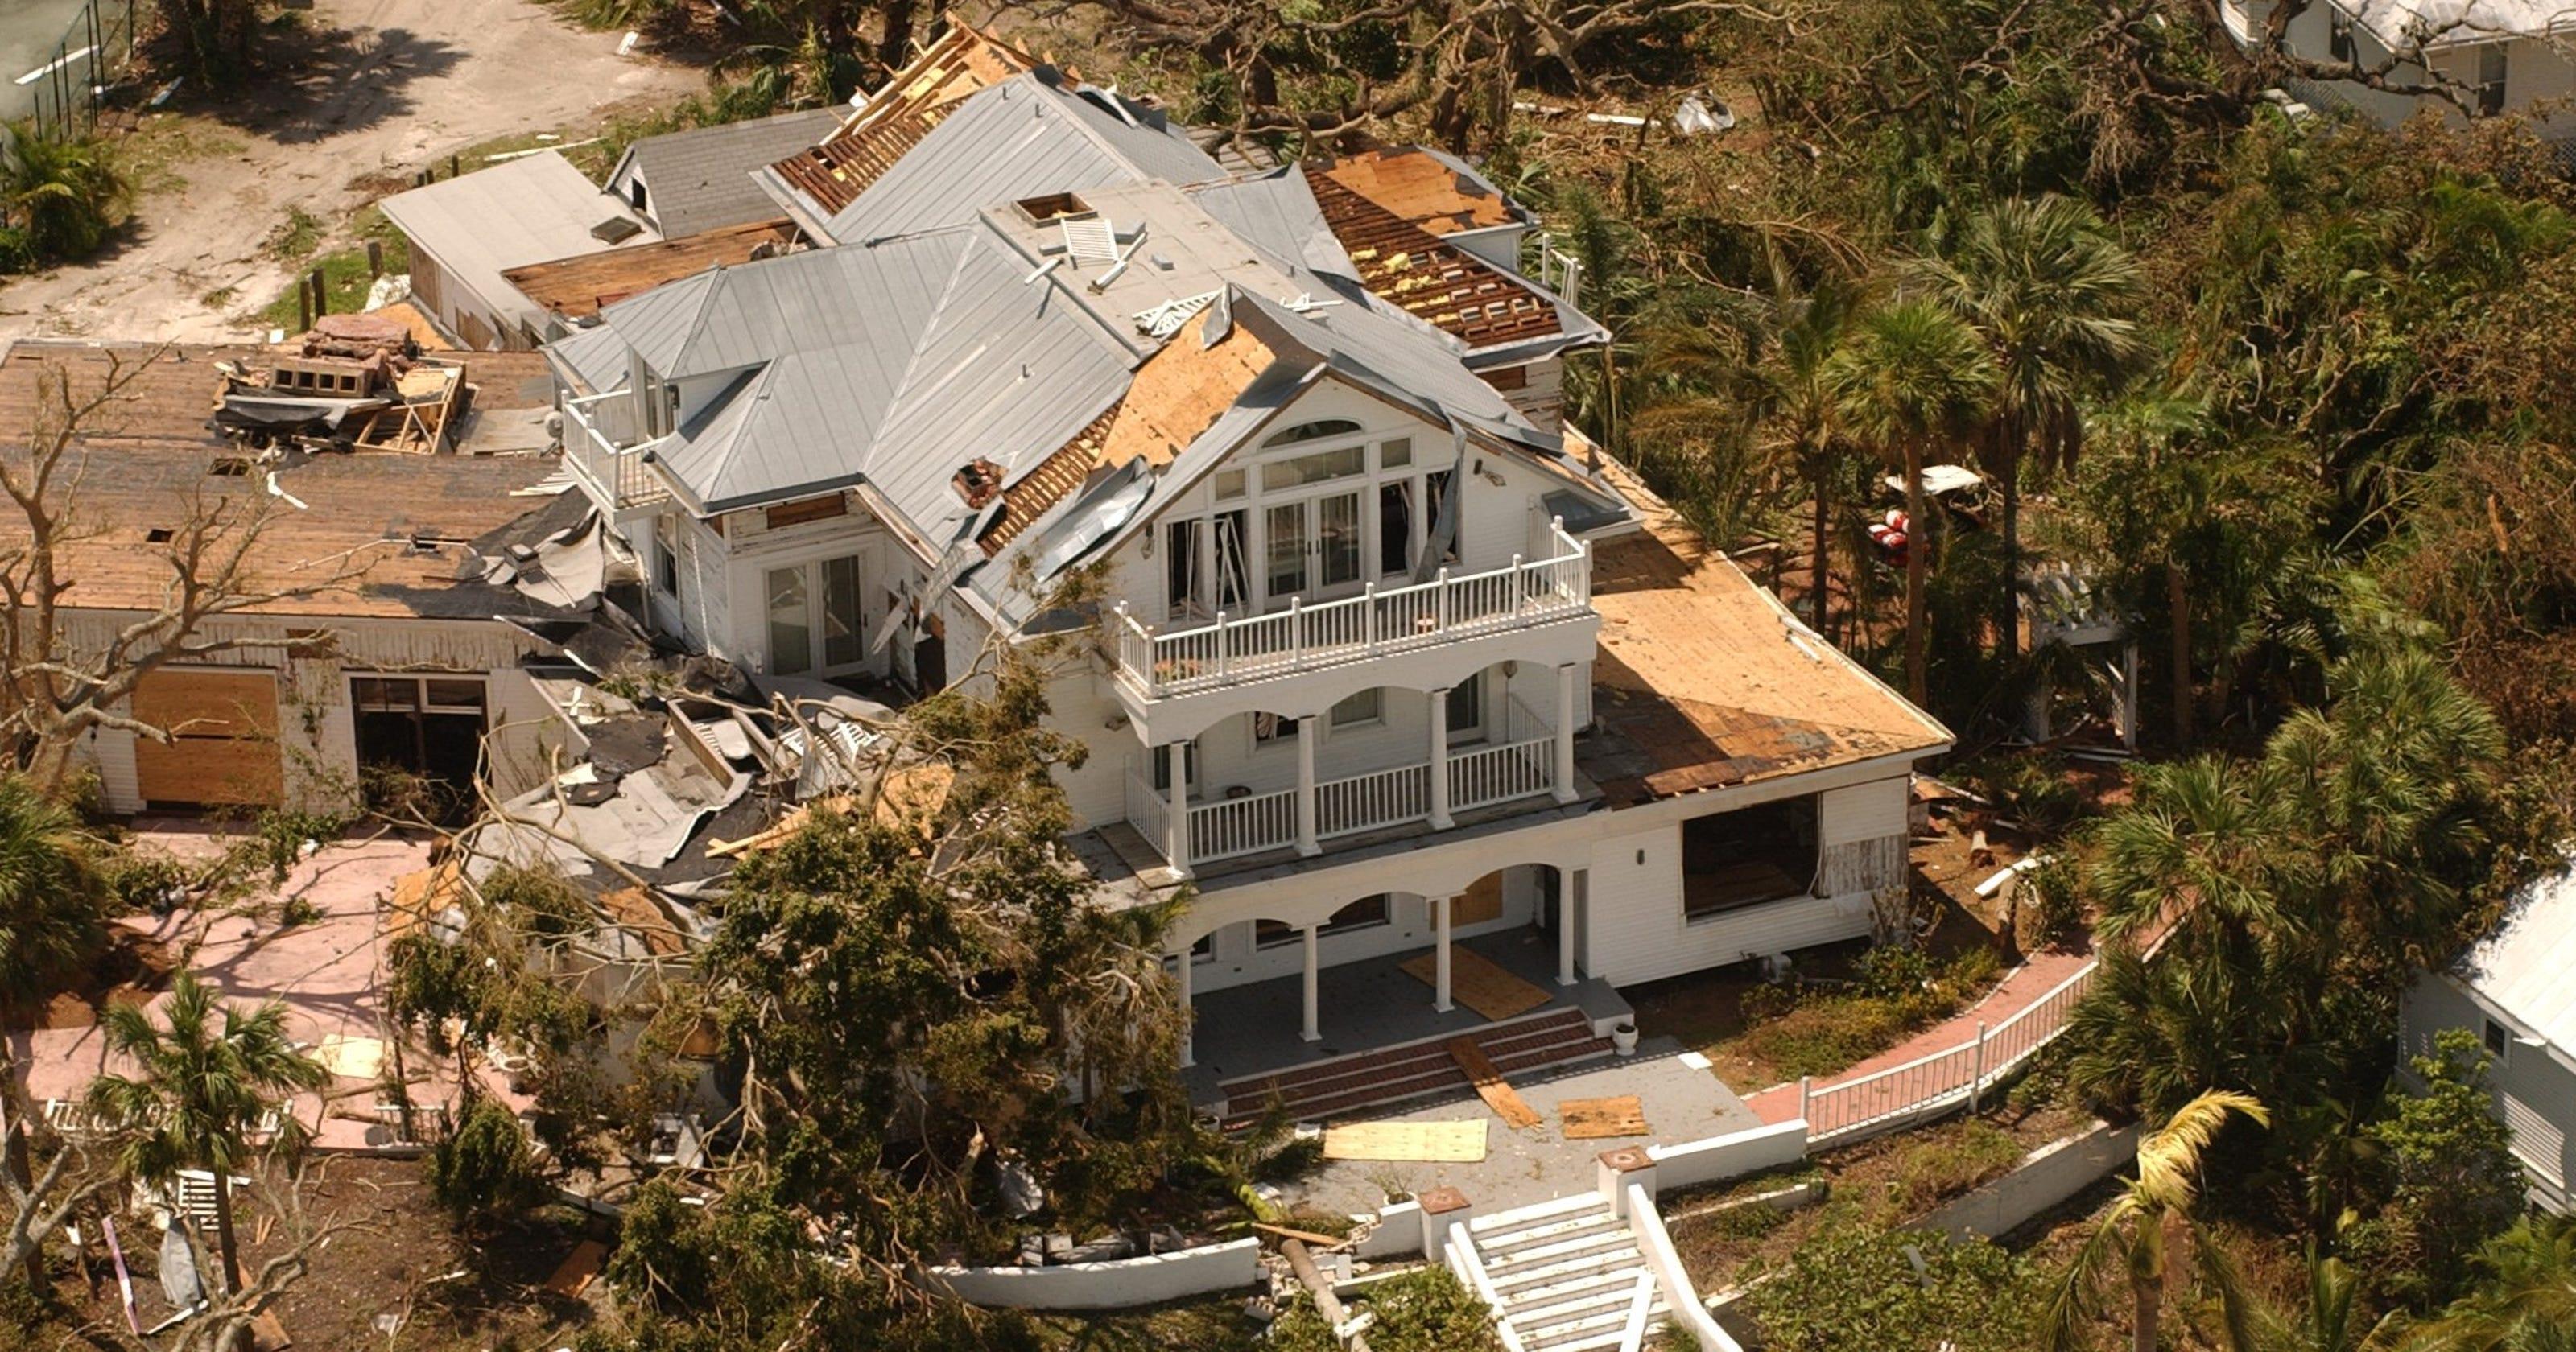 Hurricane insurance: Open your eyes before disaster